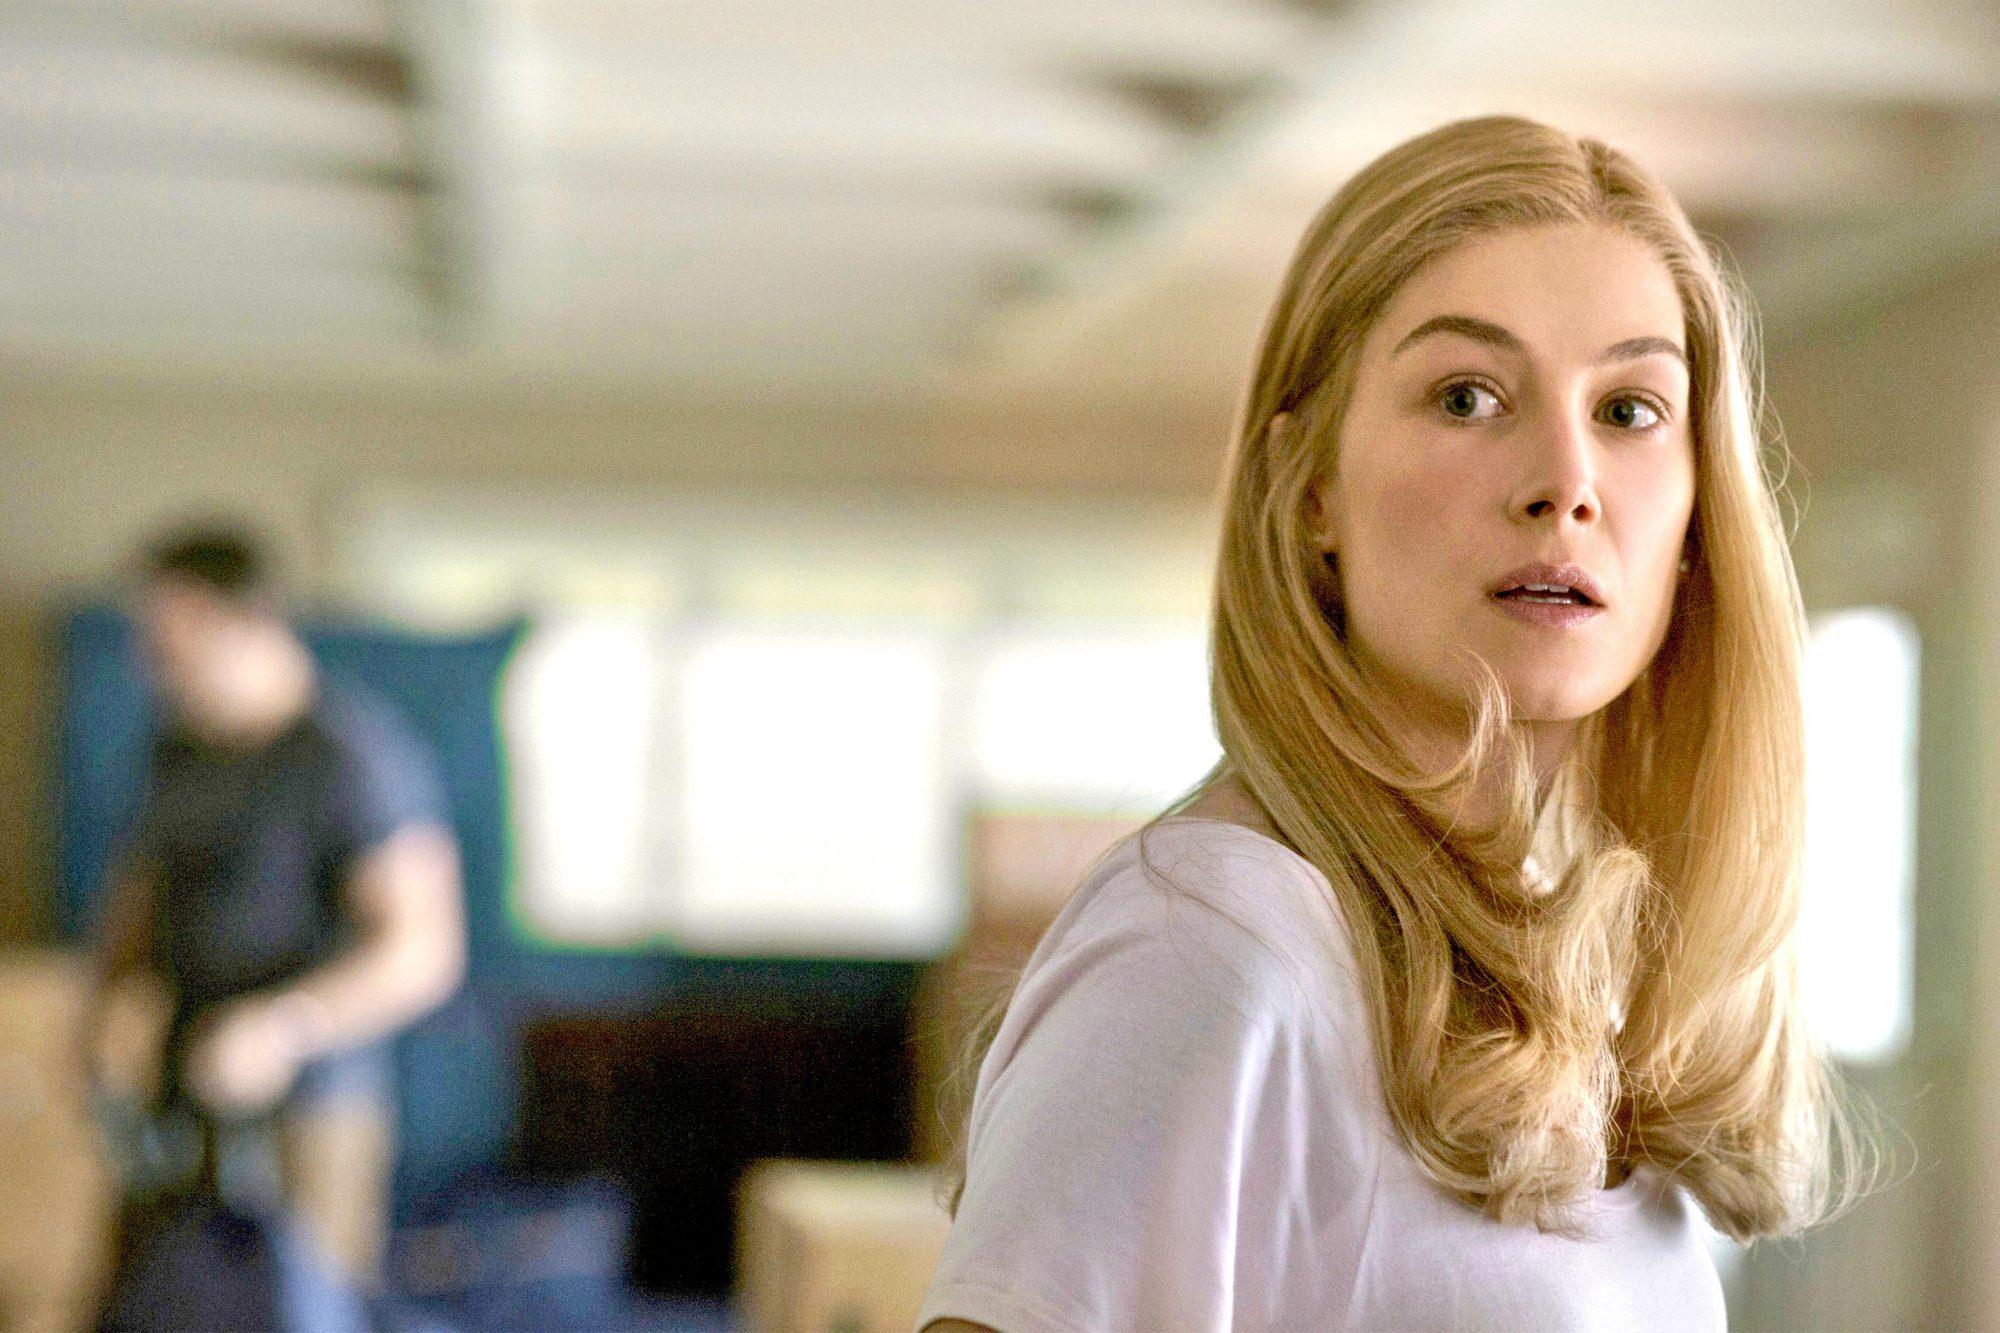 GONE GIRL (2014)Rosamund Pike